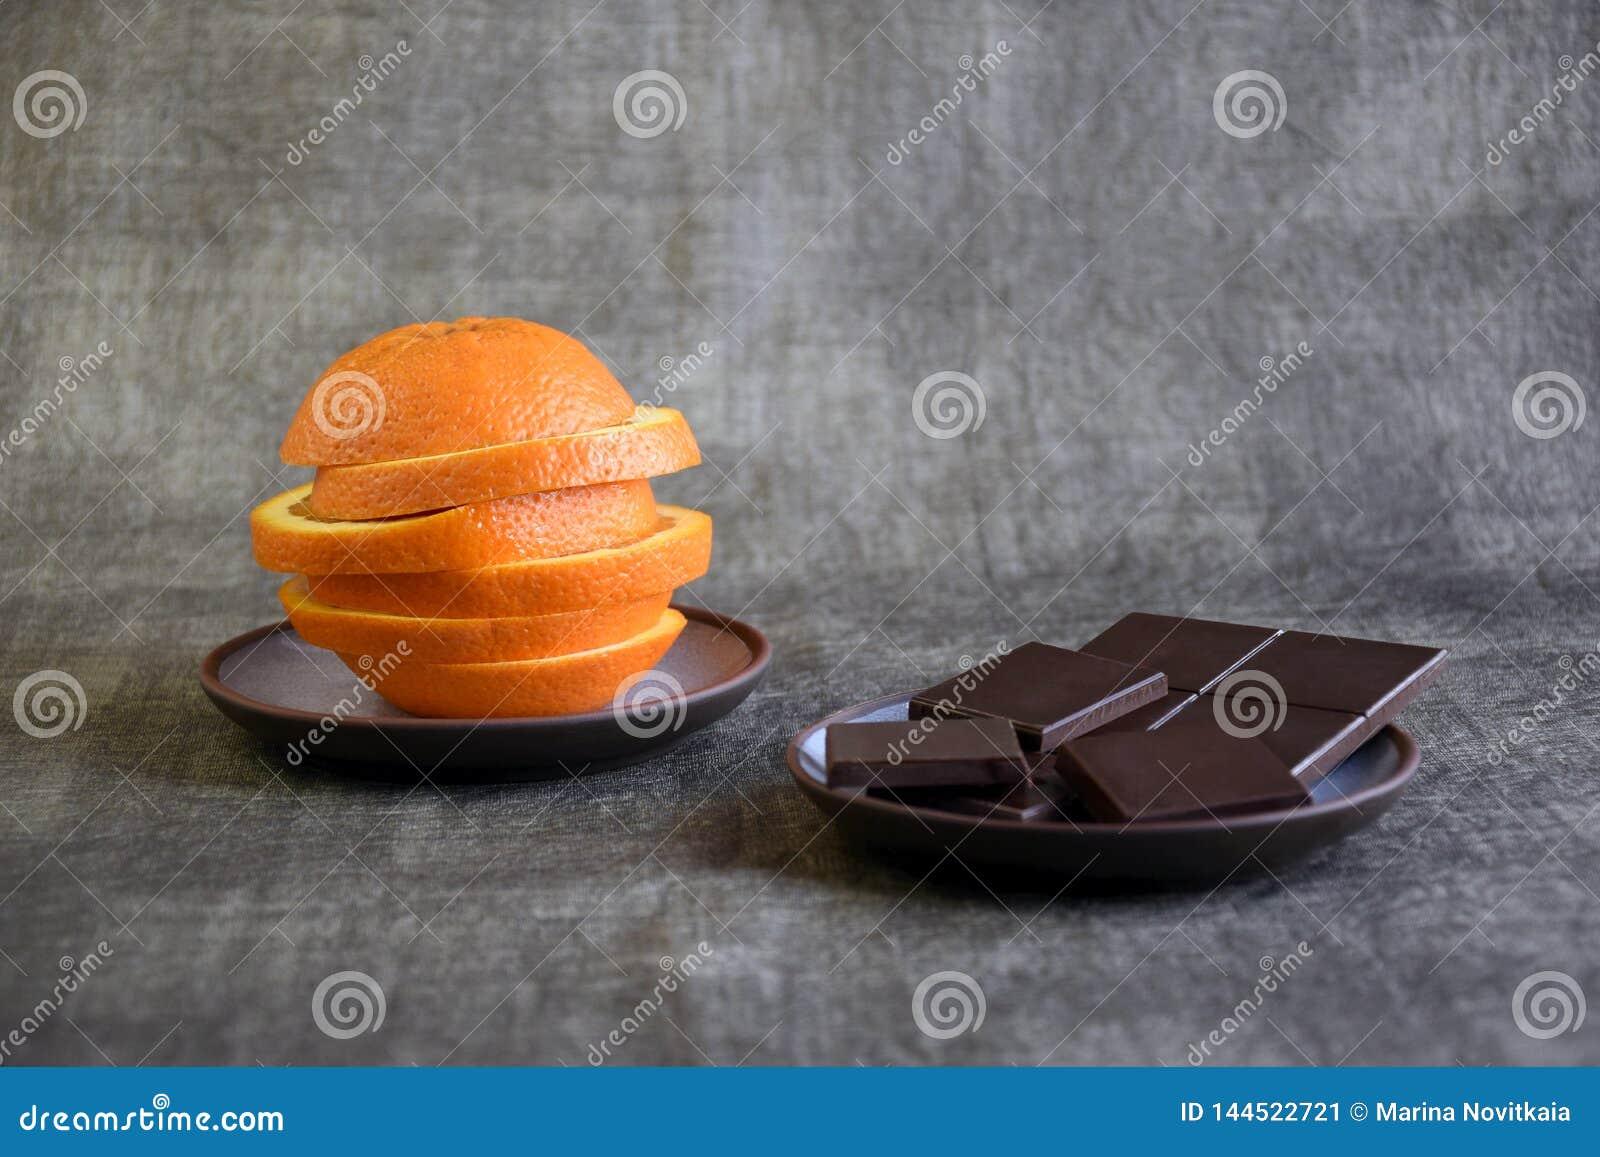 Sliced fresh orange and dark chocolate